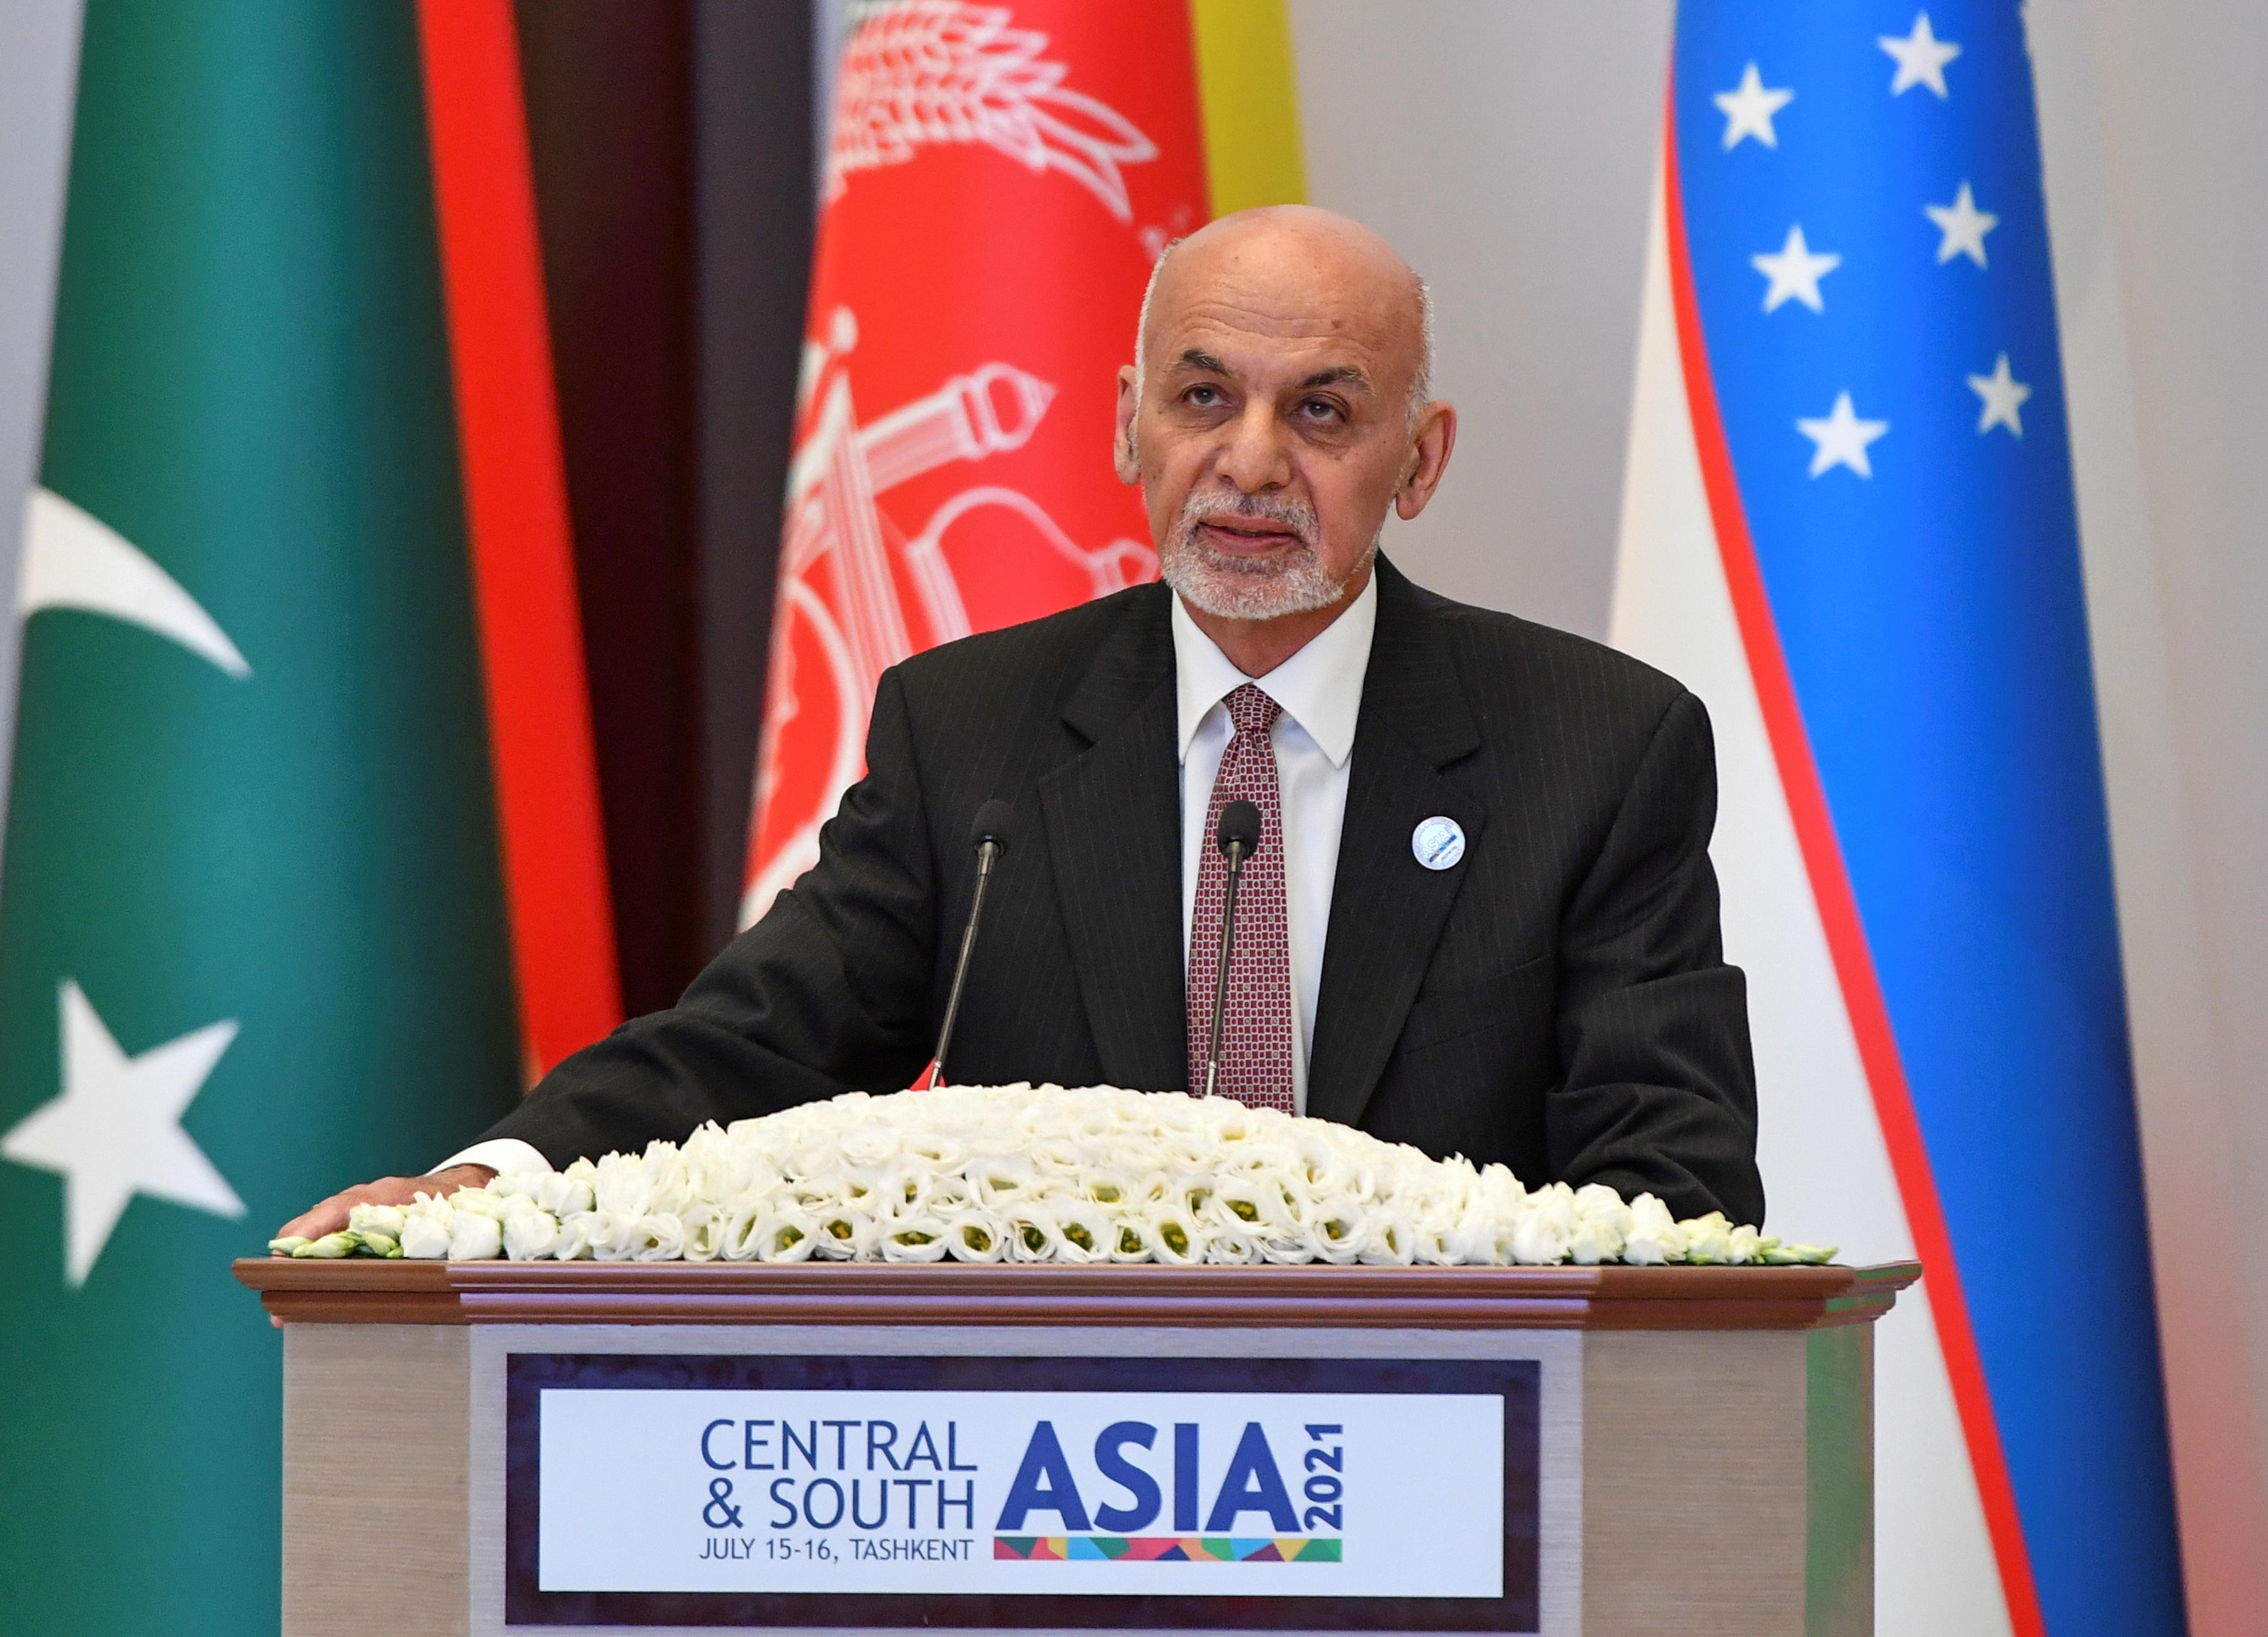 Afghanistan's President Ashraf Ghani attends Central-South Asia trade Summit in Tashkent, Uzbekistan July 16, 2021.  REUTERS/Stringer/File Photo